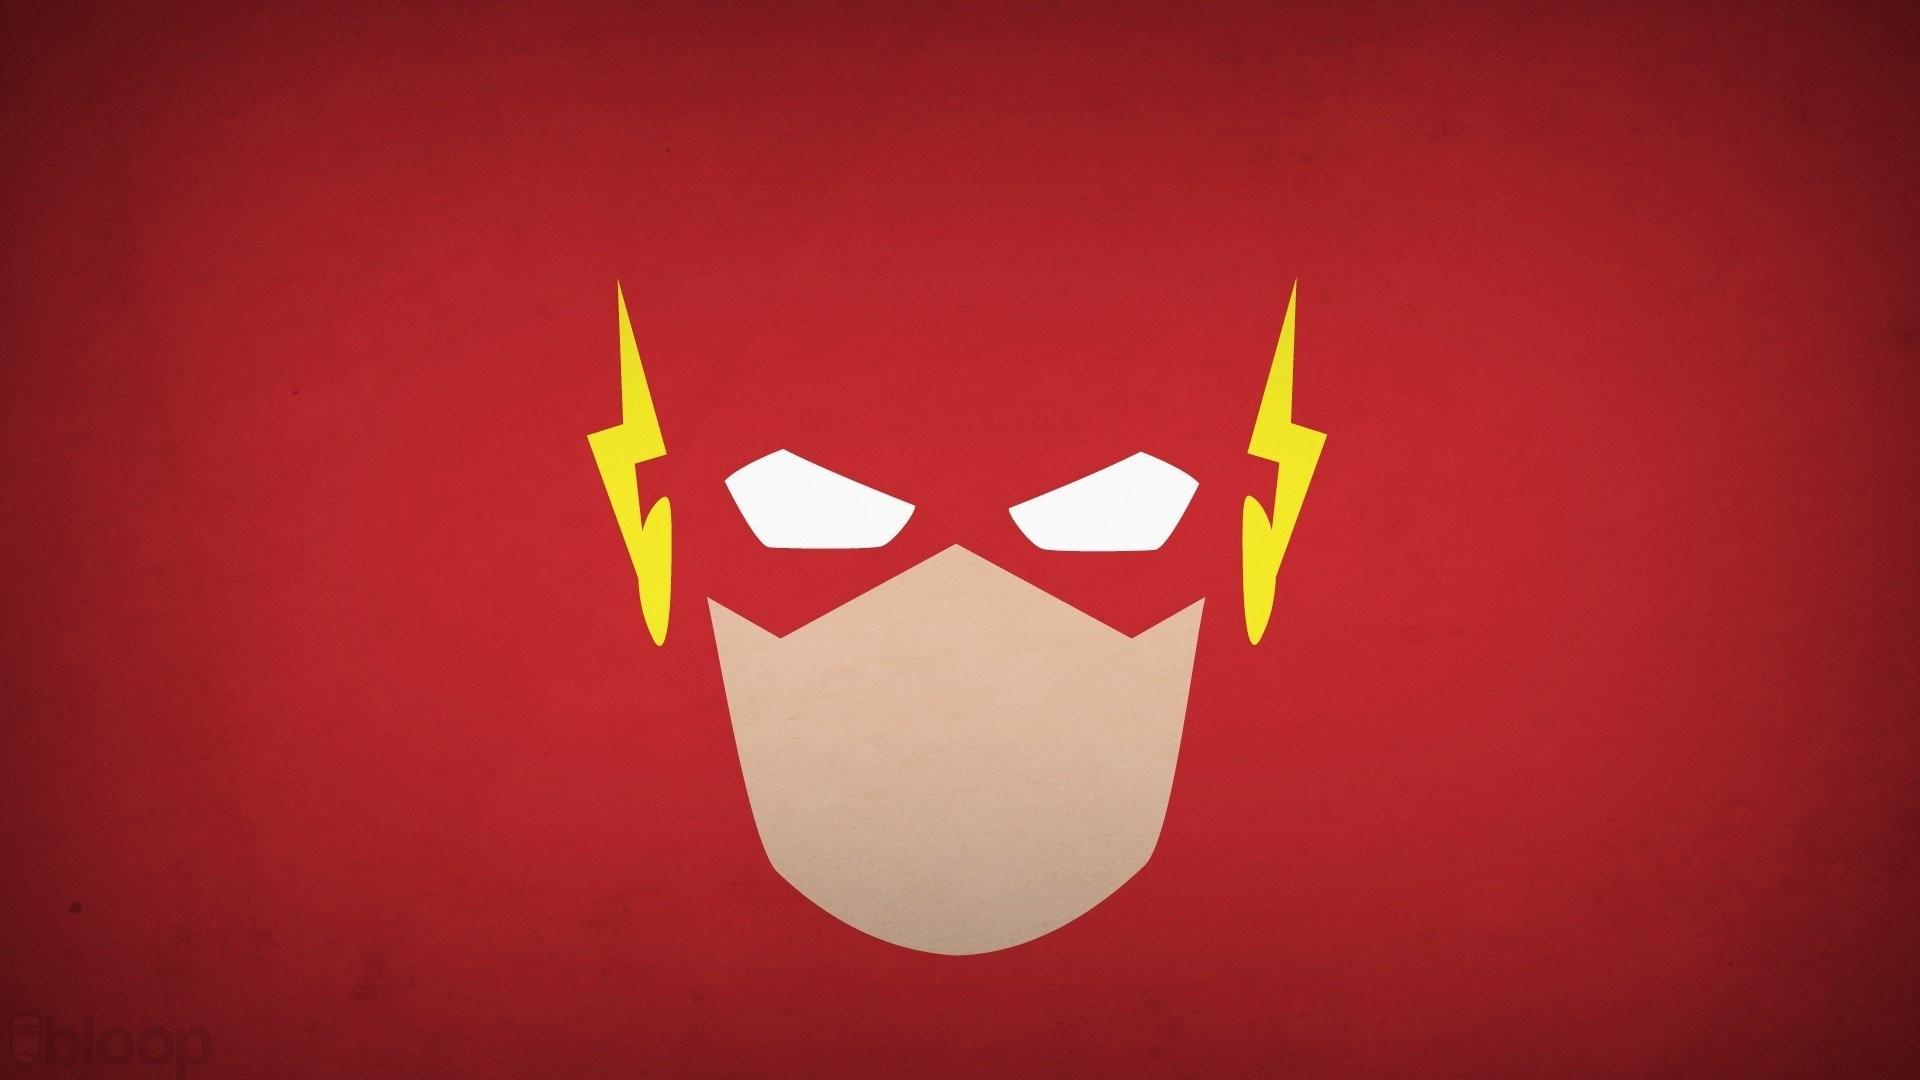 DC Comics Minimalism Simple Background The Flash Superheroes …